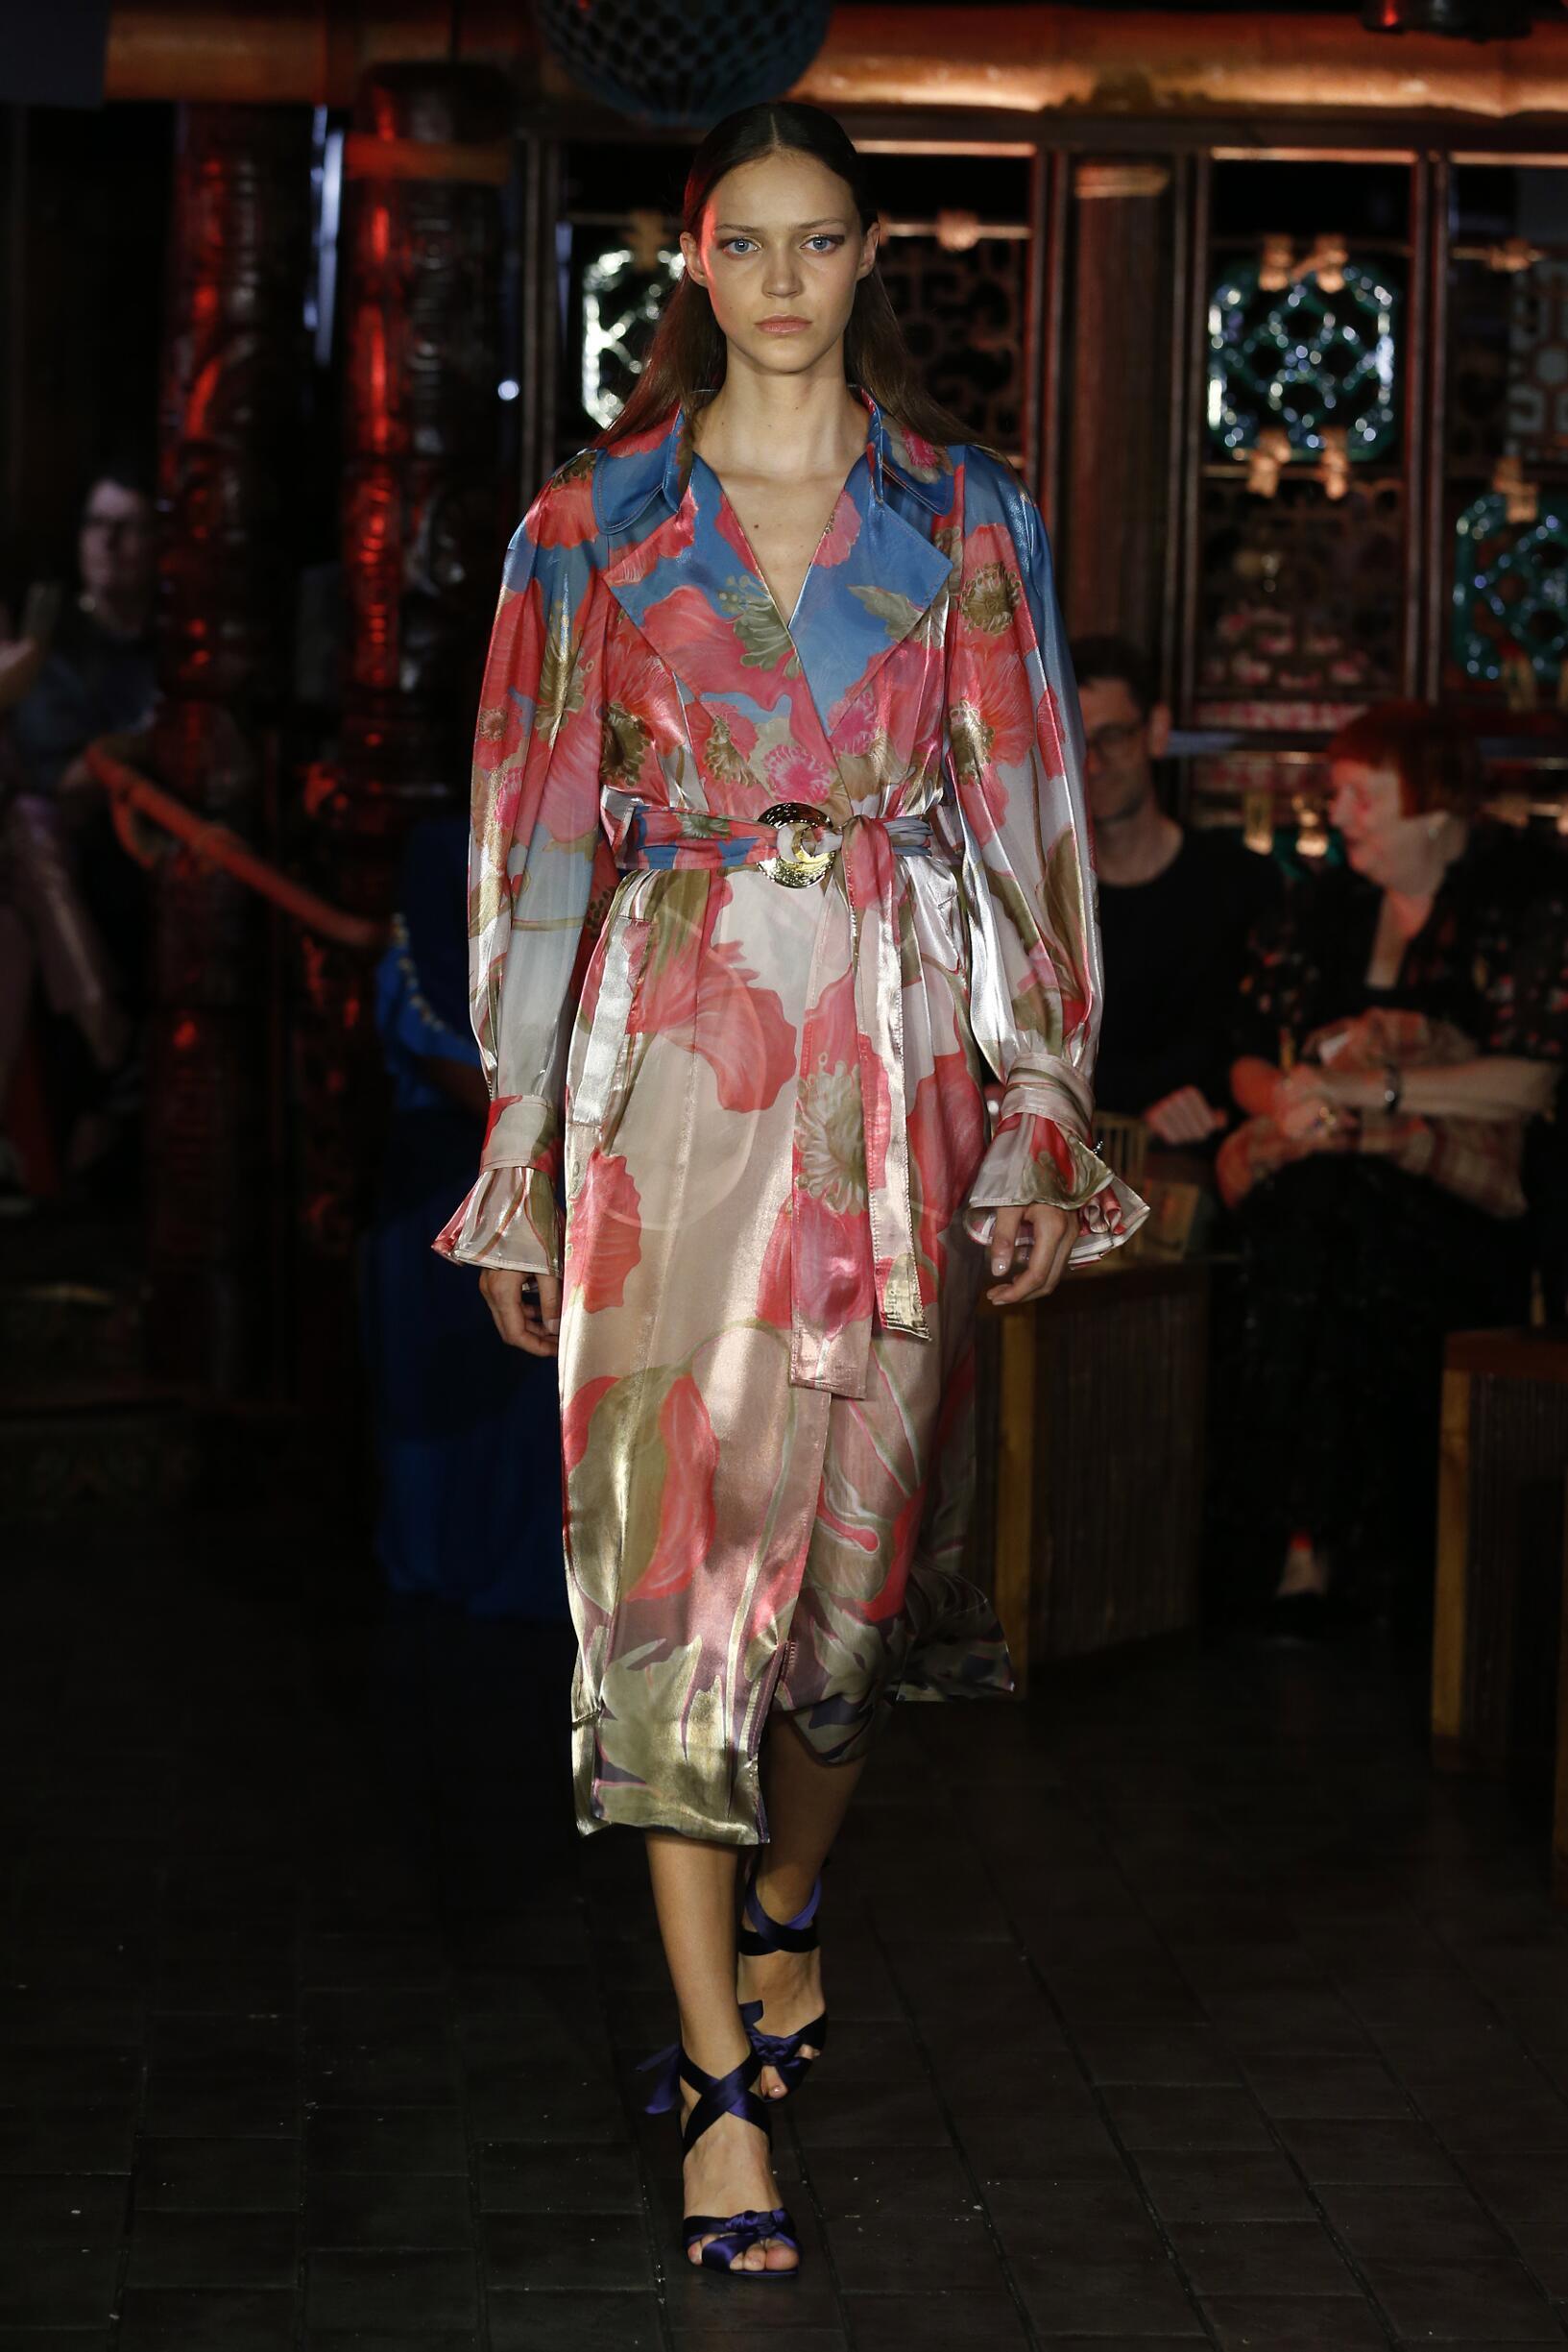 Fashion Woman Model Peter Pilotto Catwalk